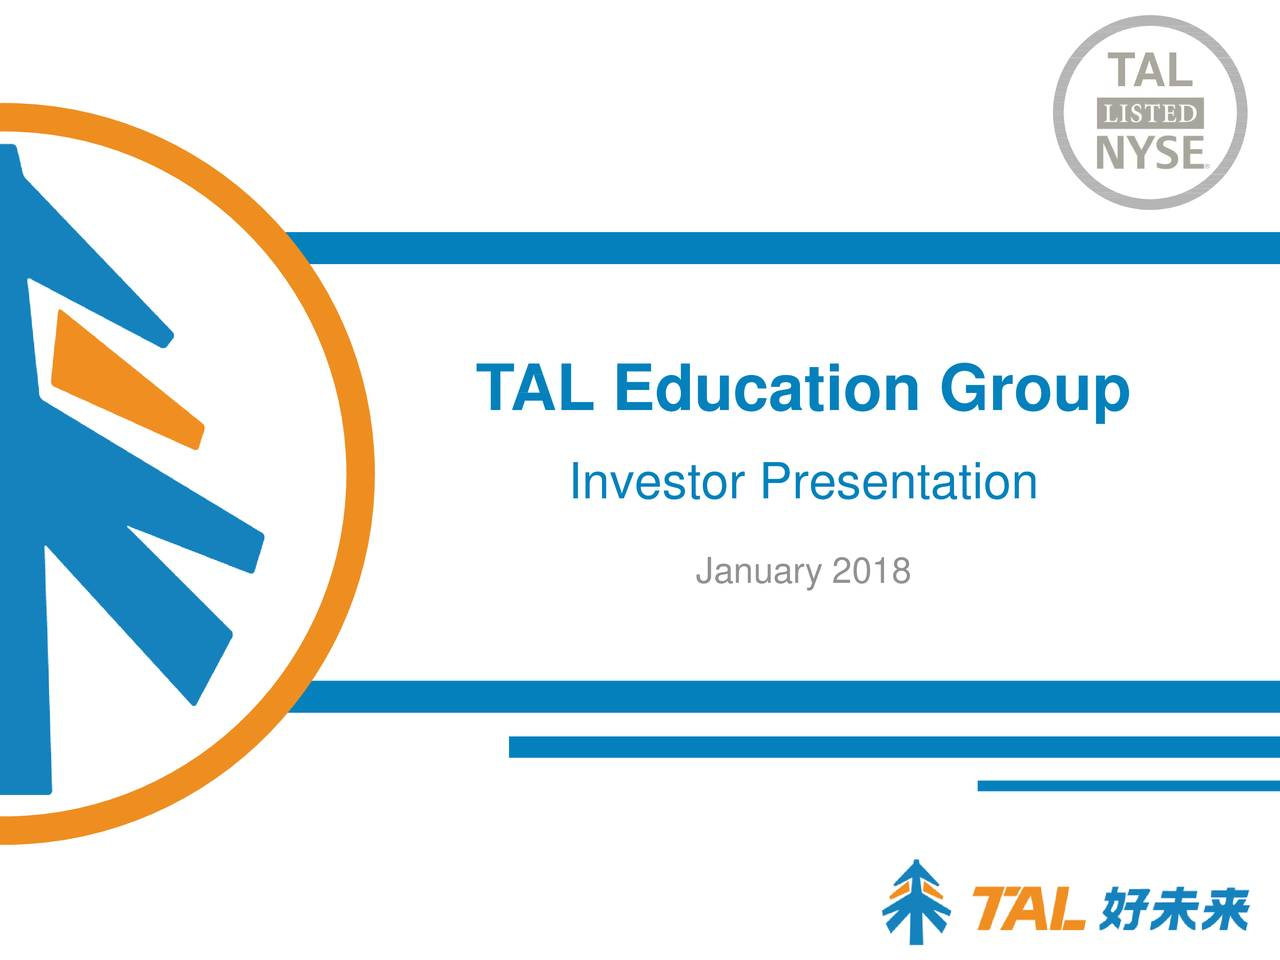 Tal Education